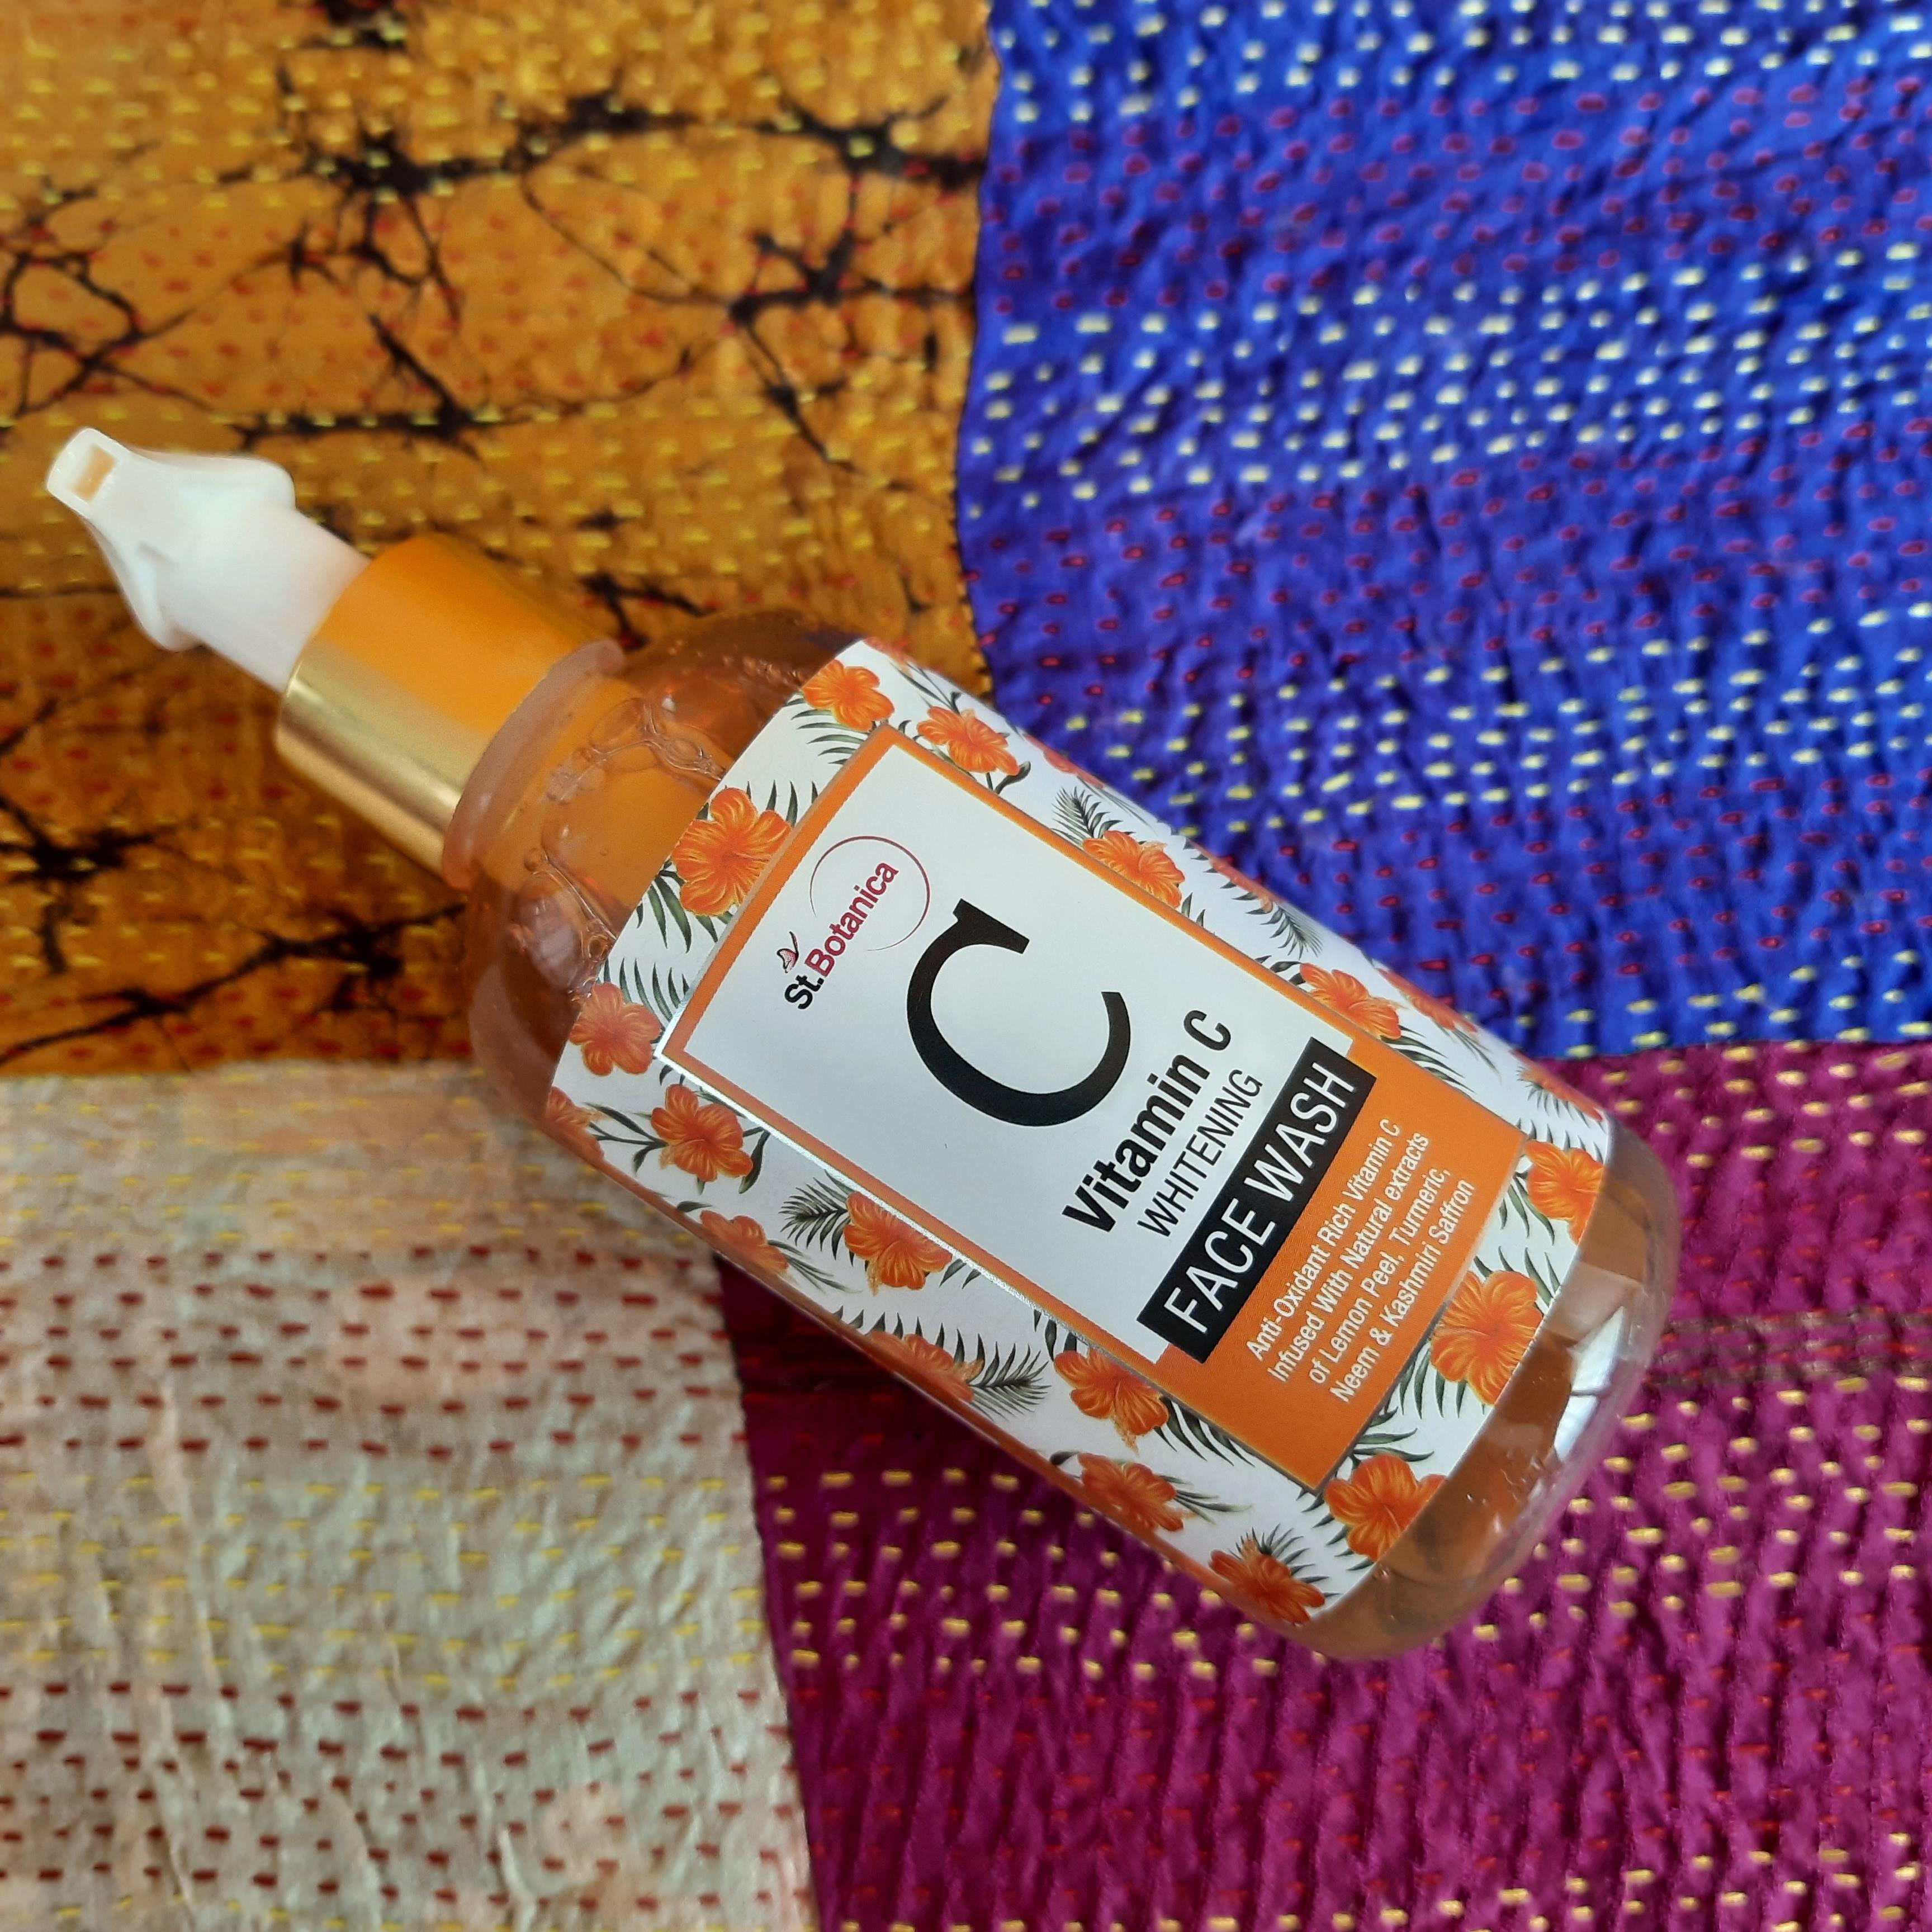 St.Botanica Vitamin C Face Wash-Best Daily Dose of Vitamin C for Oily Skin-By jaya_sathaye